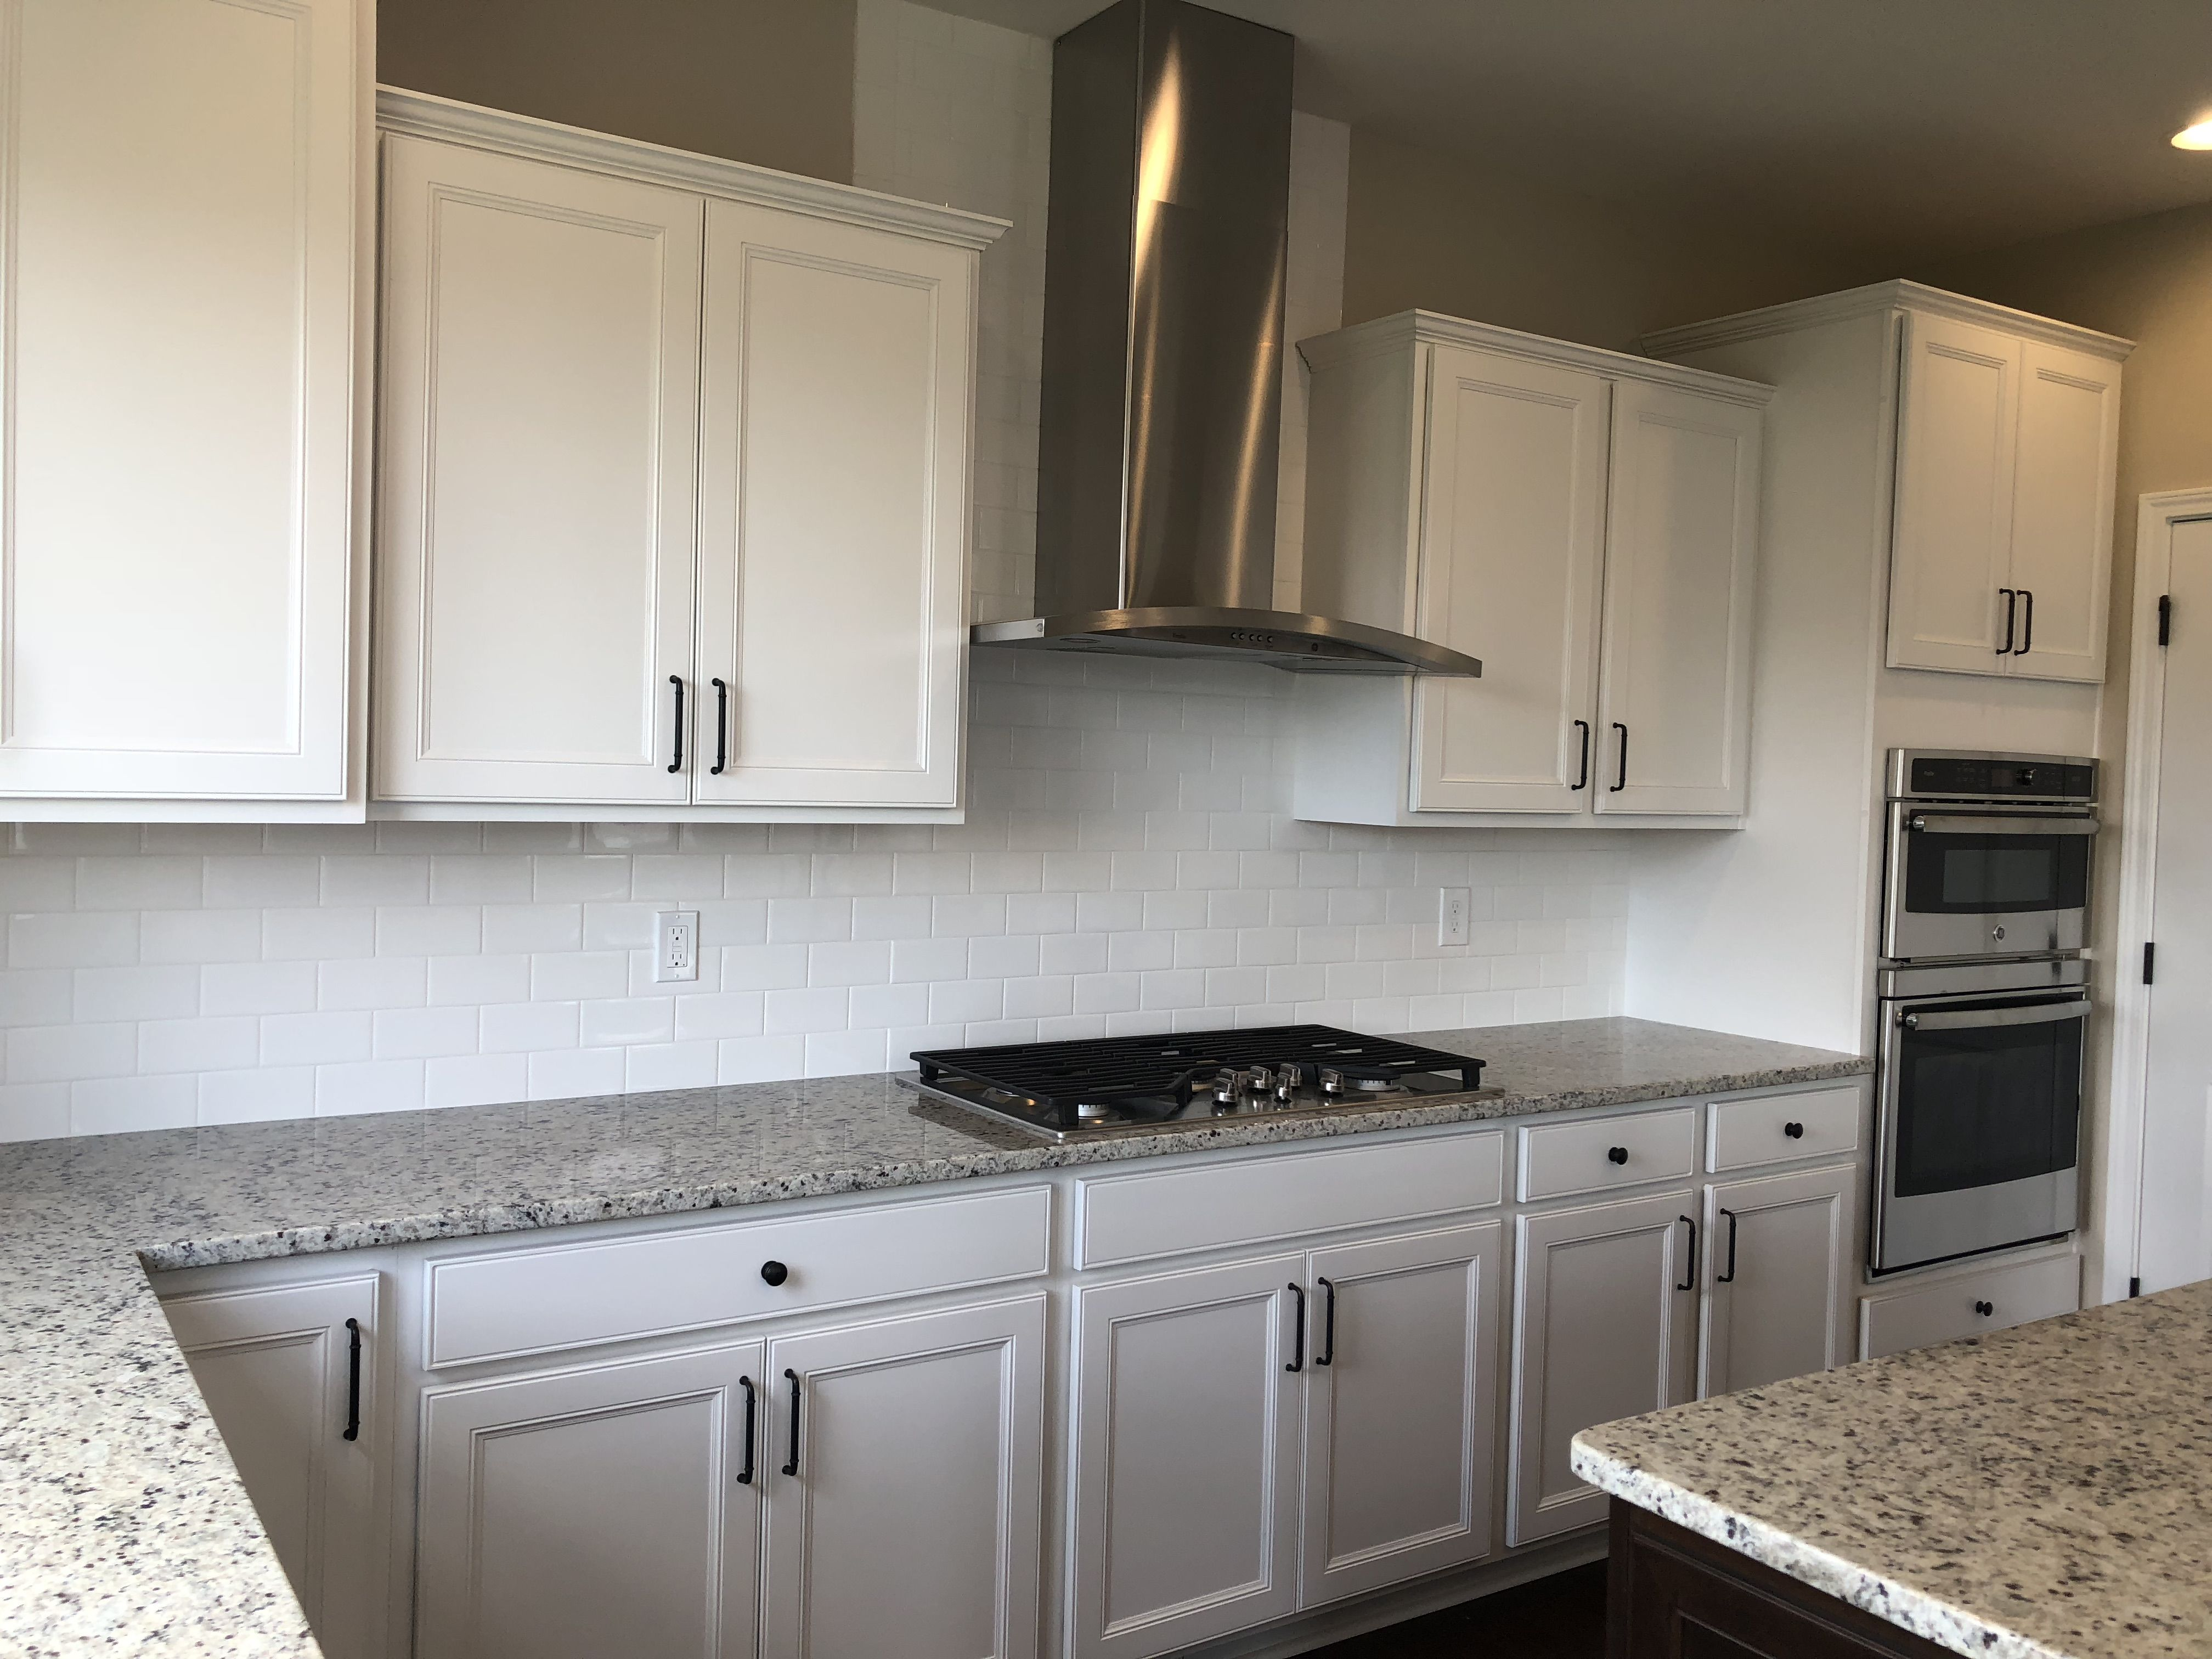 Gourmet Kitchen Landen White Painted Perimeter Cabinets French Oak Flooring New Homes Kitchen